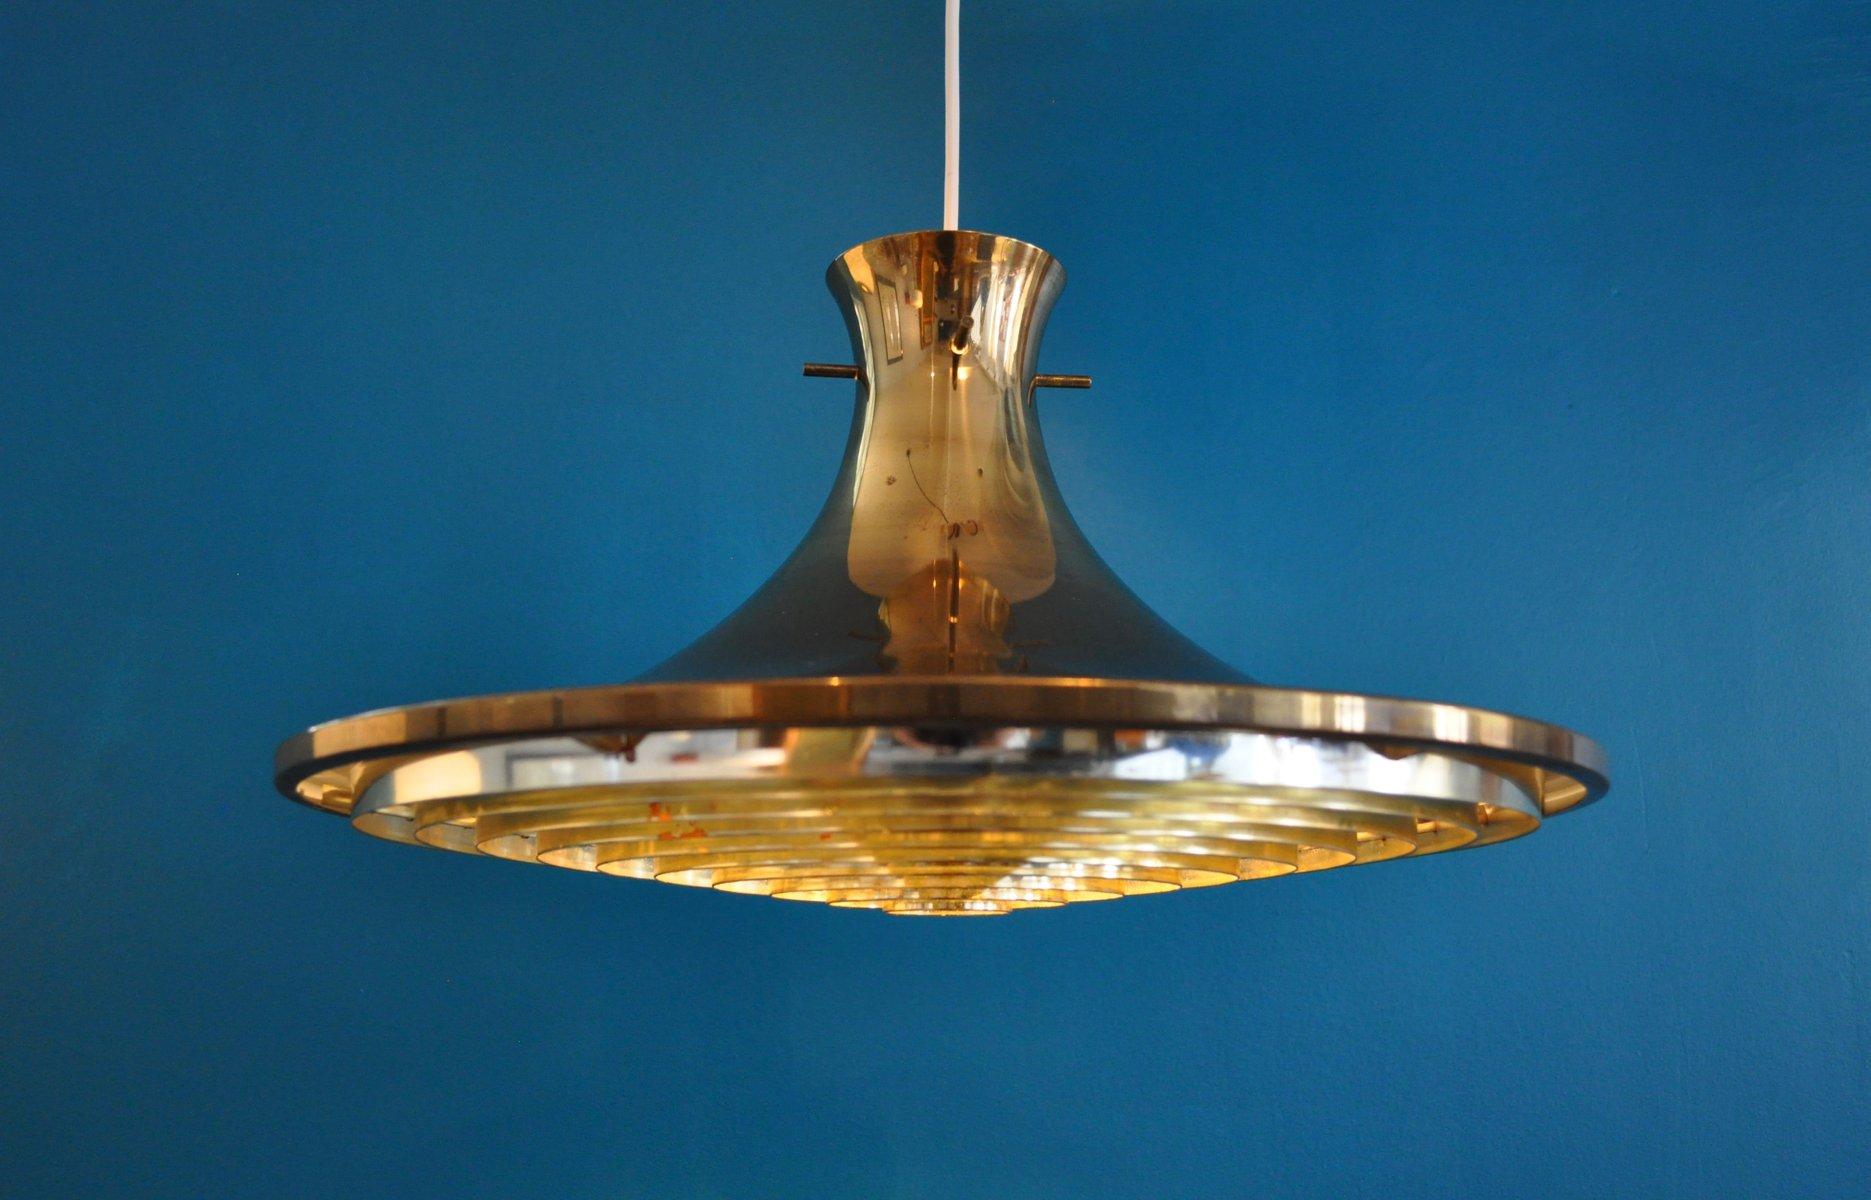 Plafoniere Rettangolari Ikea : Lampadario vate ikea: lampade ikea lampada tavolo social